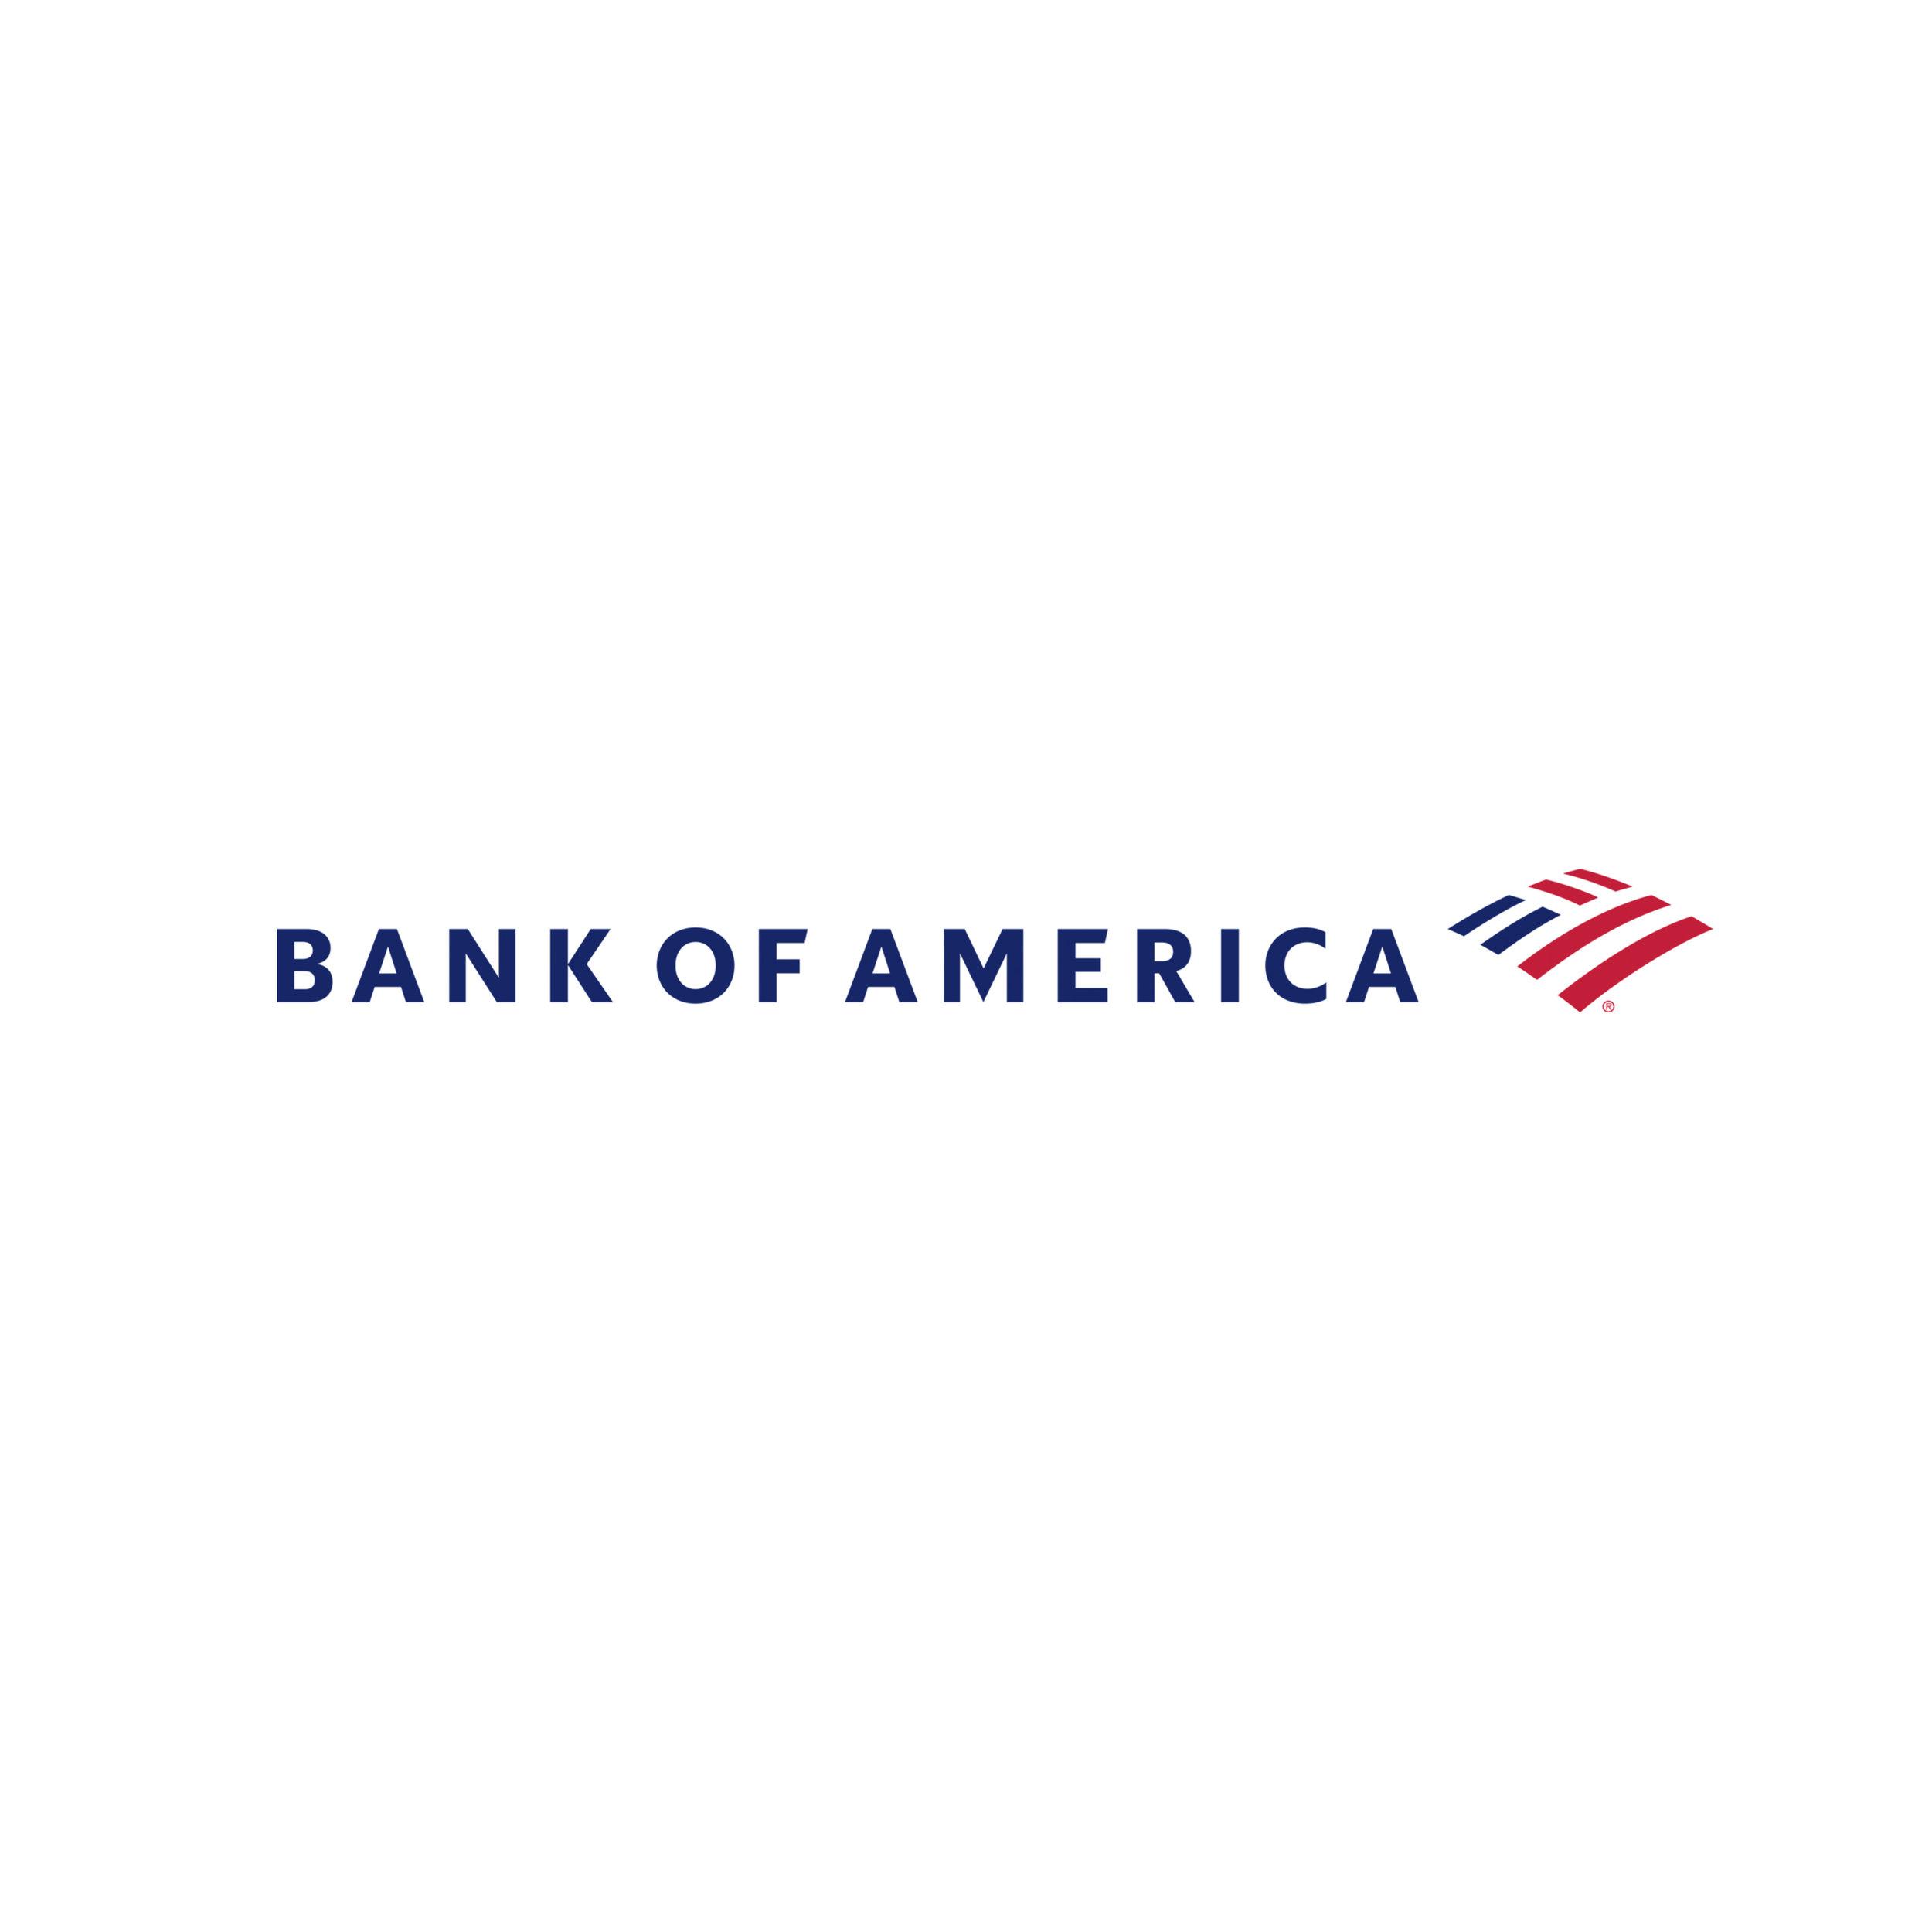 SS-Bank of America_new2.jpg